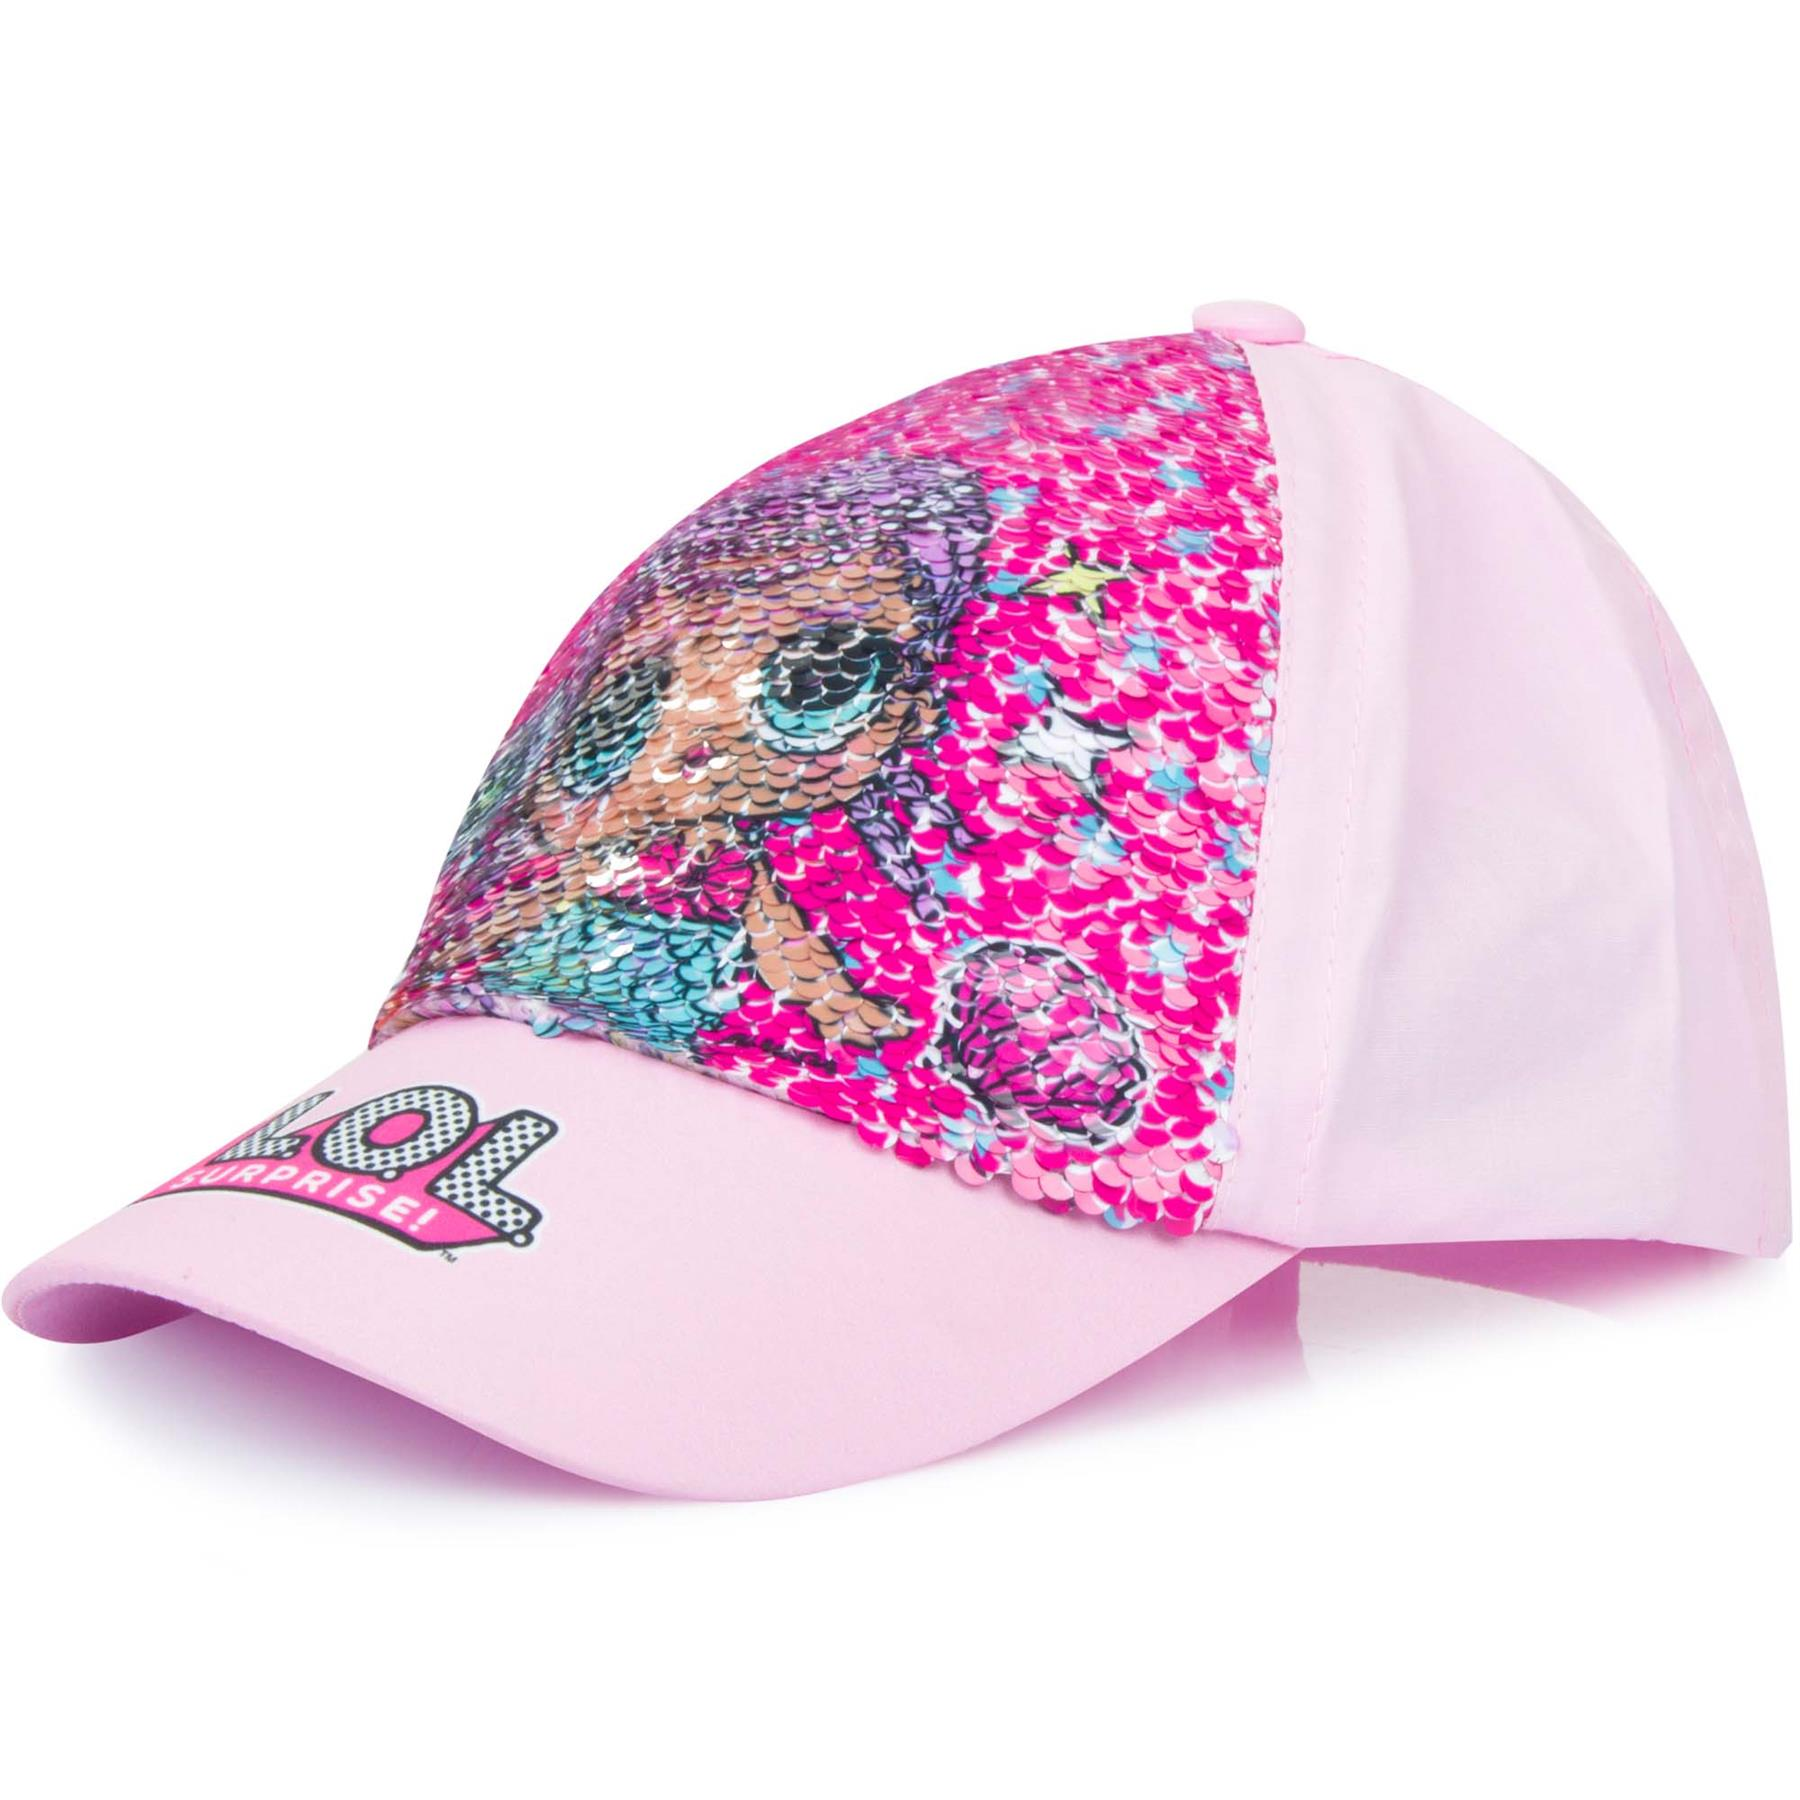 218842656 Details about Girls LOL Surprise Baseball Reversible Pink Sequin Cap Hat  Sun Summer